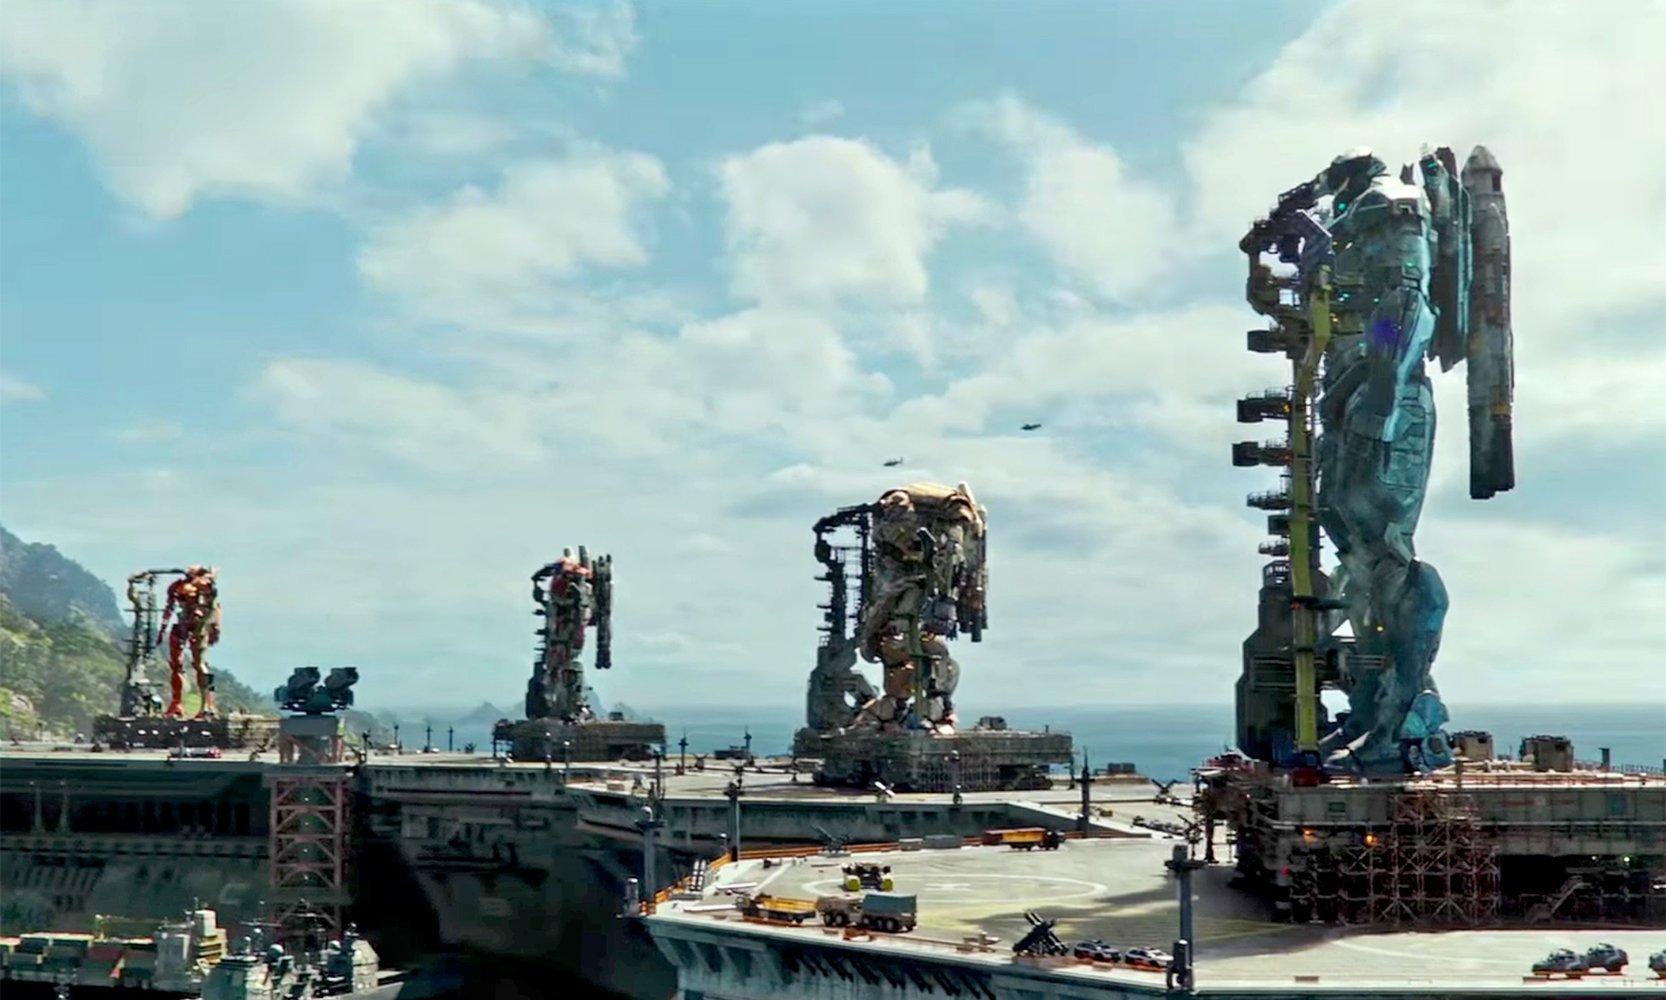 'Pacific Rim: Uprising' with Jetpacks! Trailer Shows Mechs on Rockets https://t.co/z1S1gCvMMv https://t.co/4qHtZdFQIg